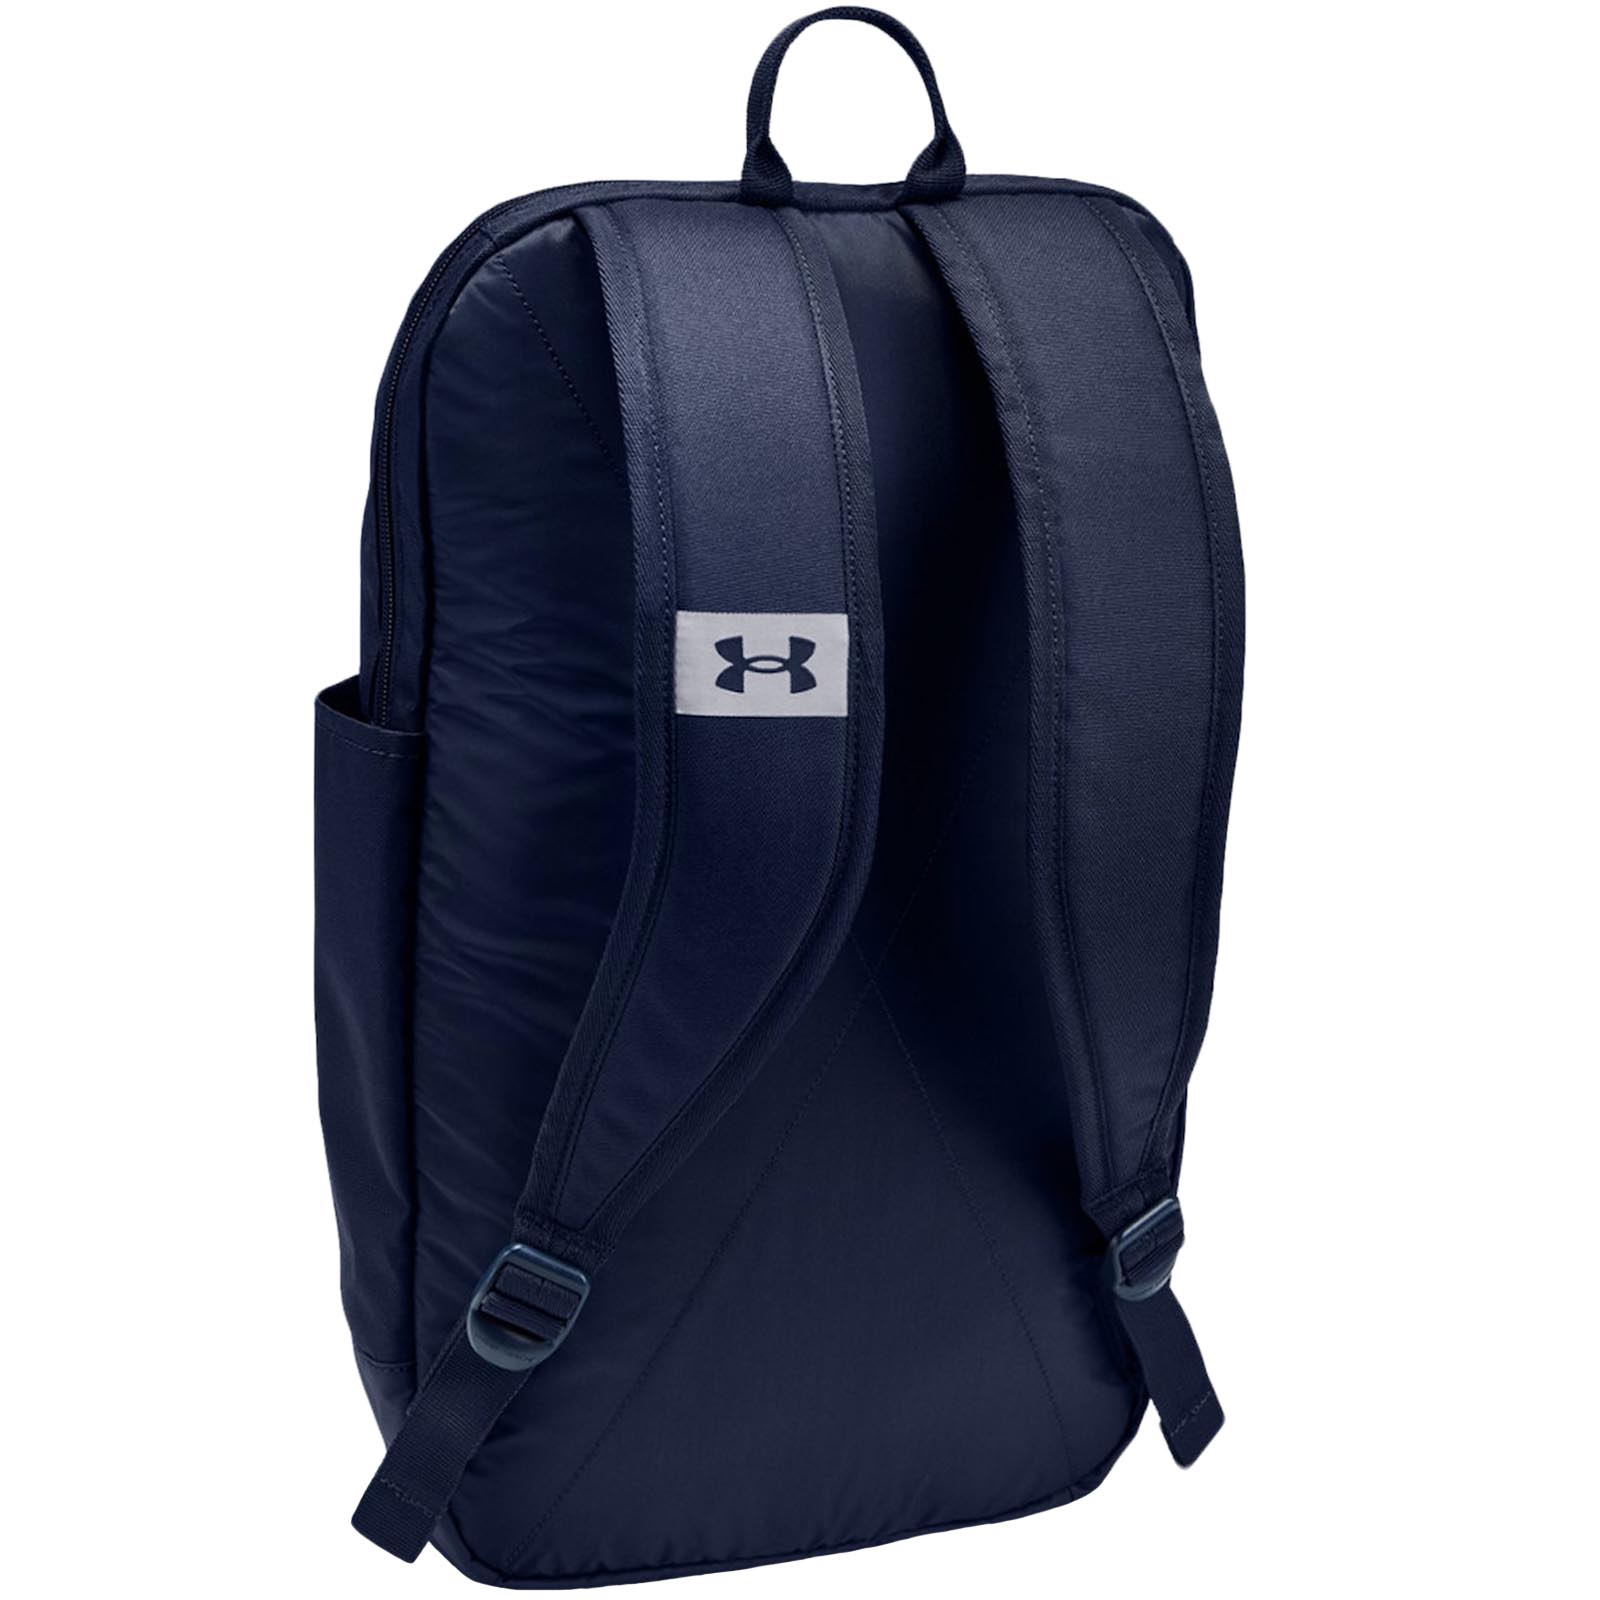 Under-Armour-UA-Unisex-Patterson-Rucksack-Bag-Backpack thumbnail 7